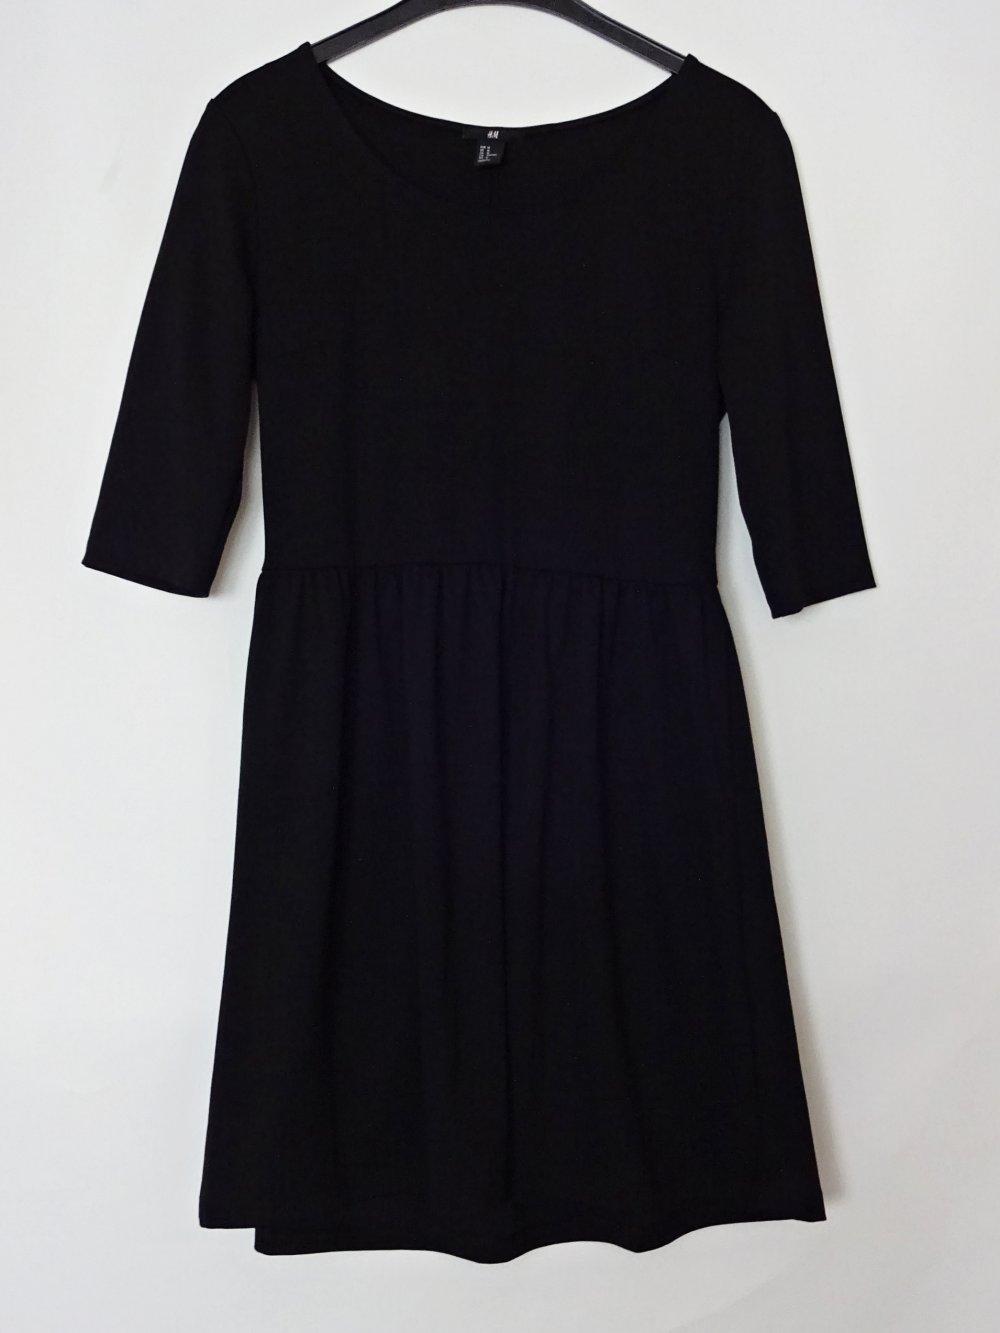 Schwarzes Basic Kleid Gr. 20 Gr. 20 Gr. M Gr. 20/20